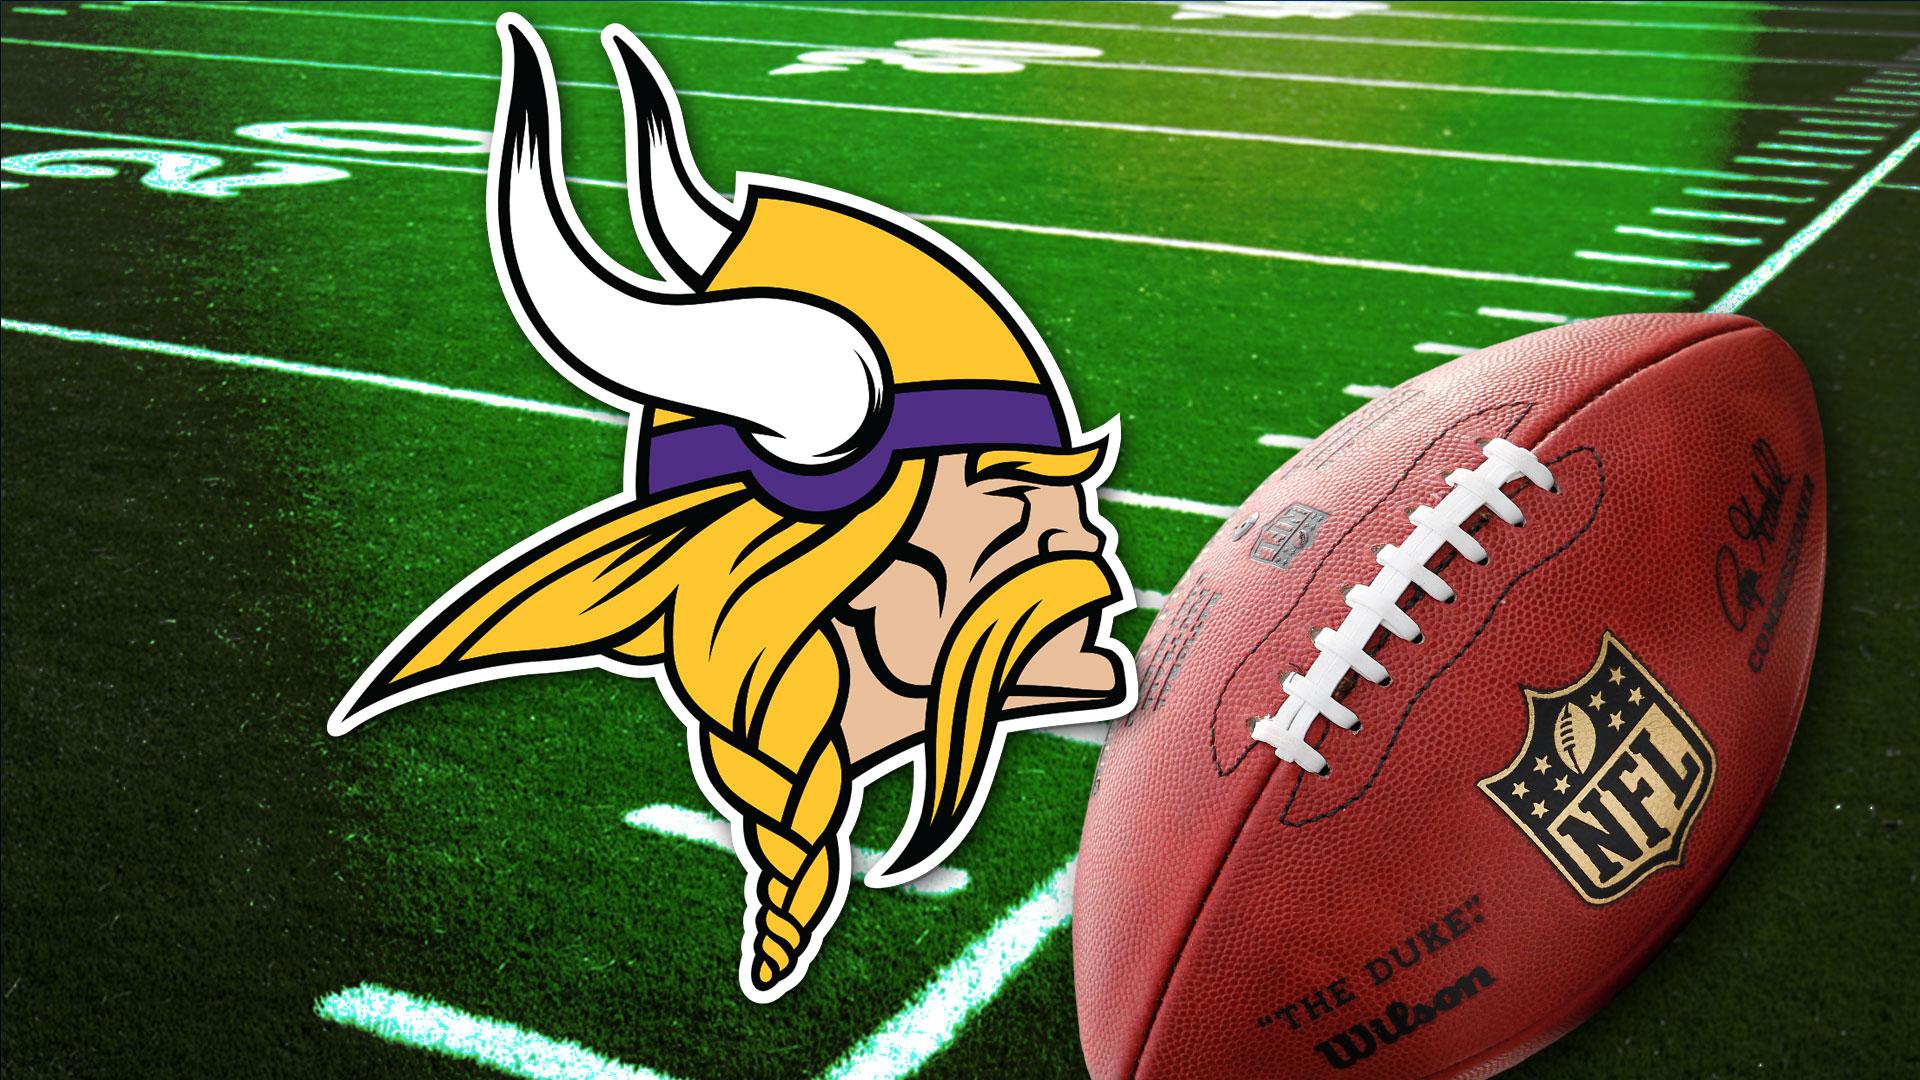 KELO-Minnesota-Vikings-logo-football_1529375698636.jpg